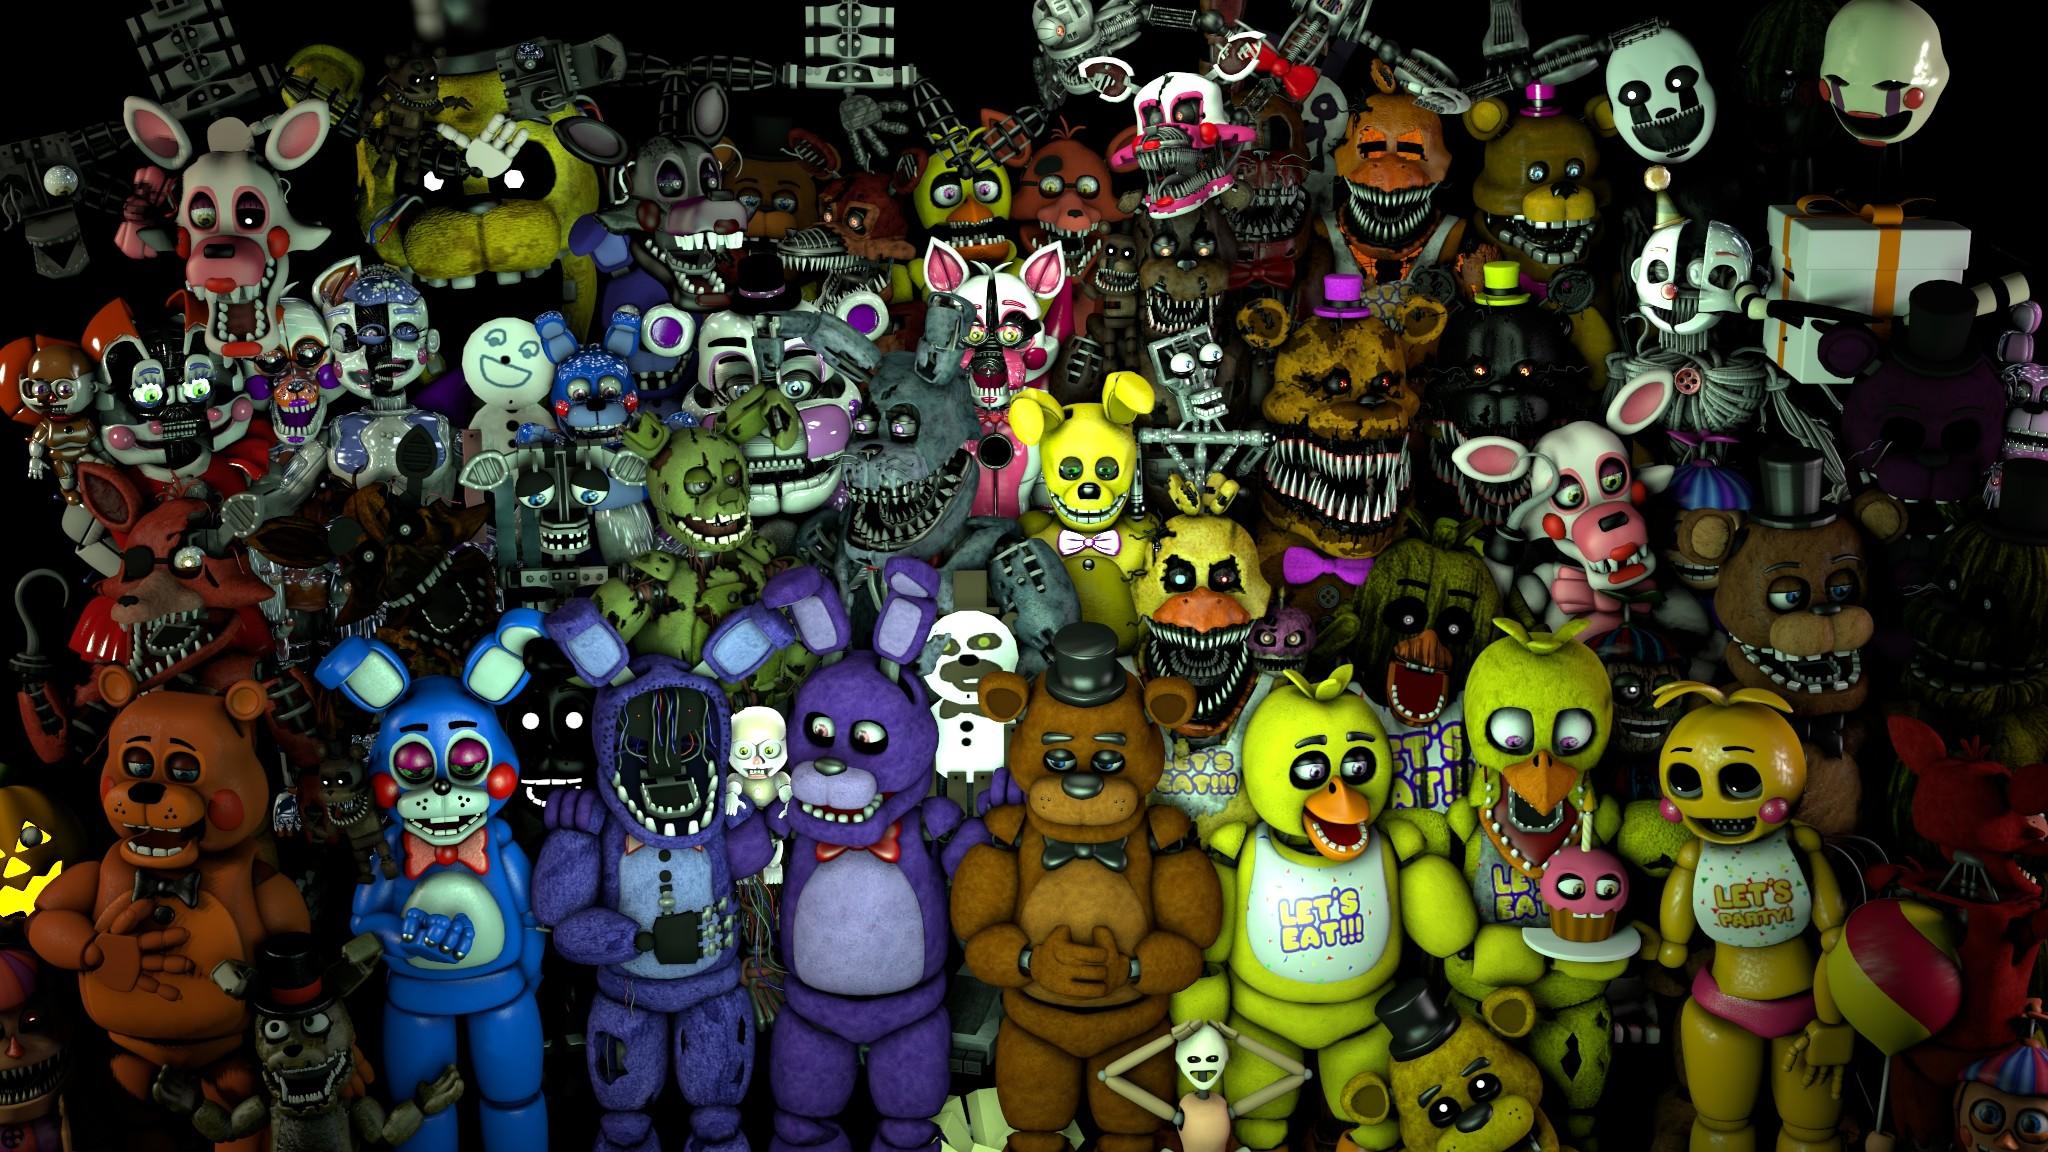 Fnaf All Characters Wallpaper (80+ images) | 2048 x 1152 jpeg 683kB